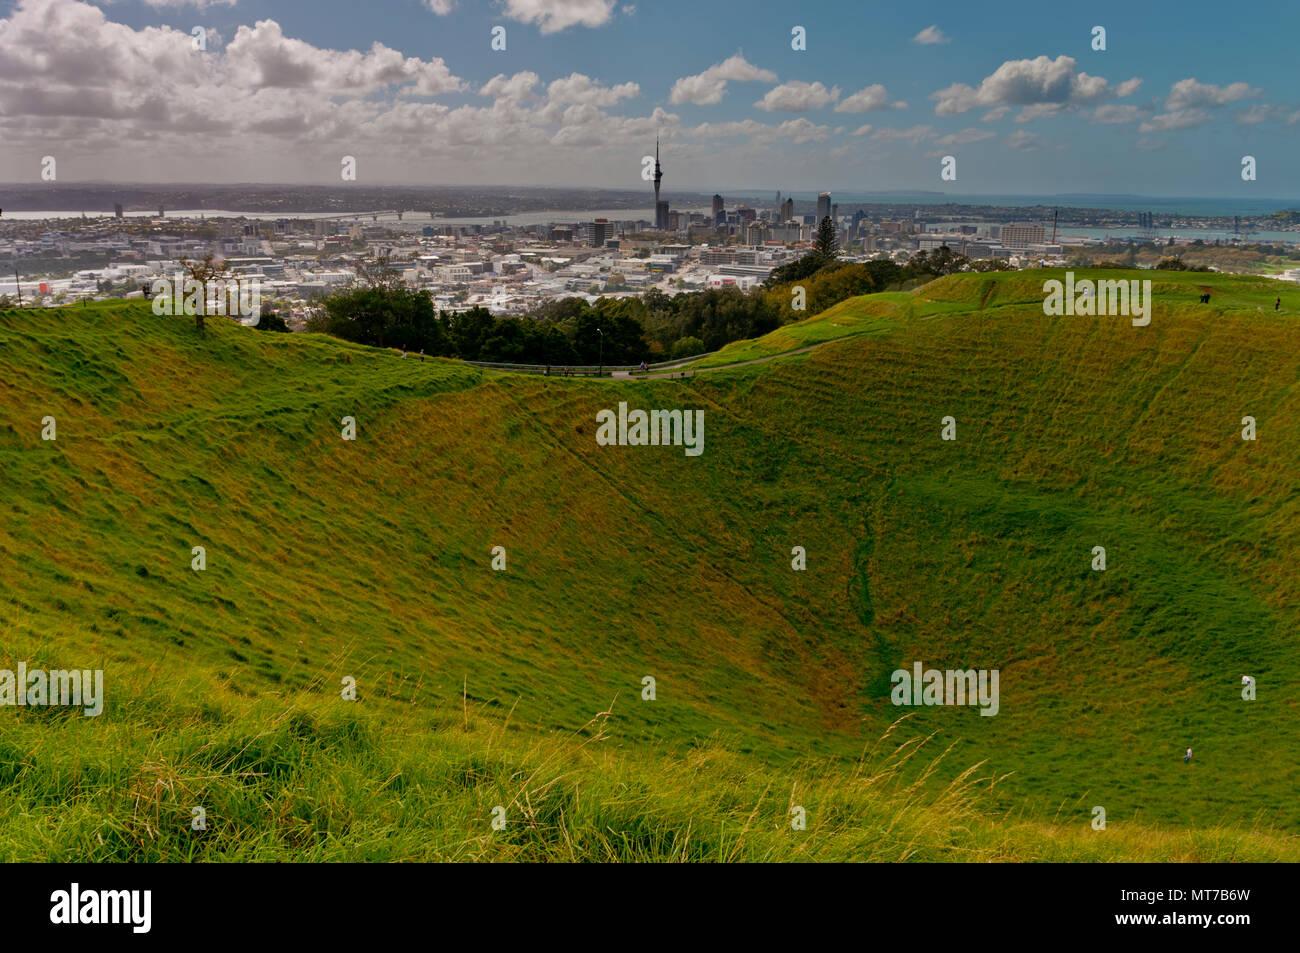 Mount Eden, Auckland, North Island, New Zealand - Stock Image